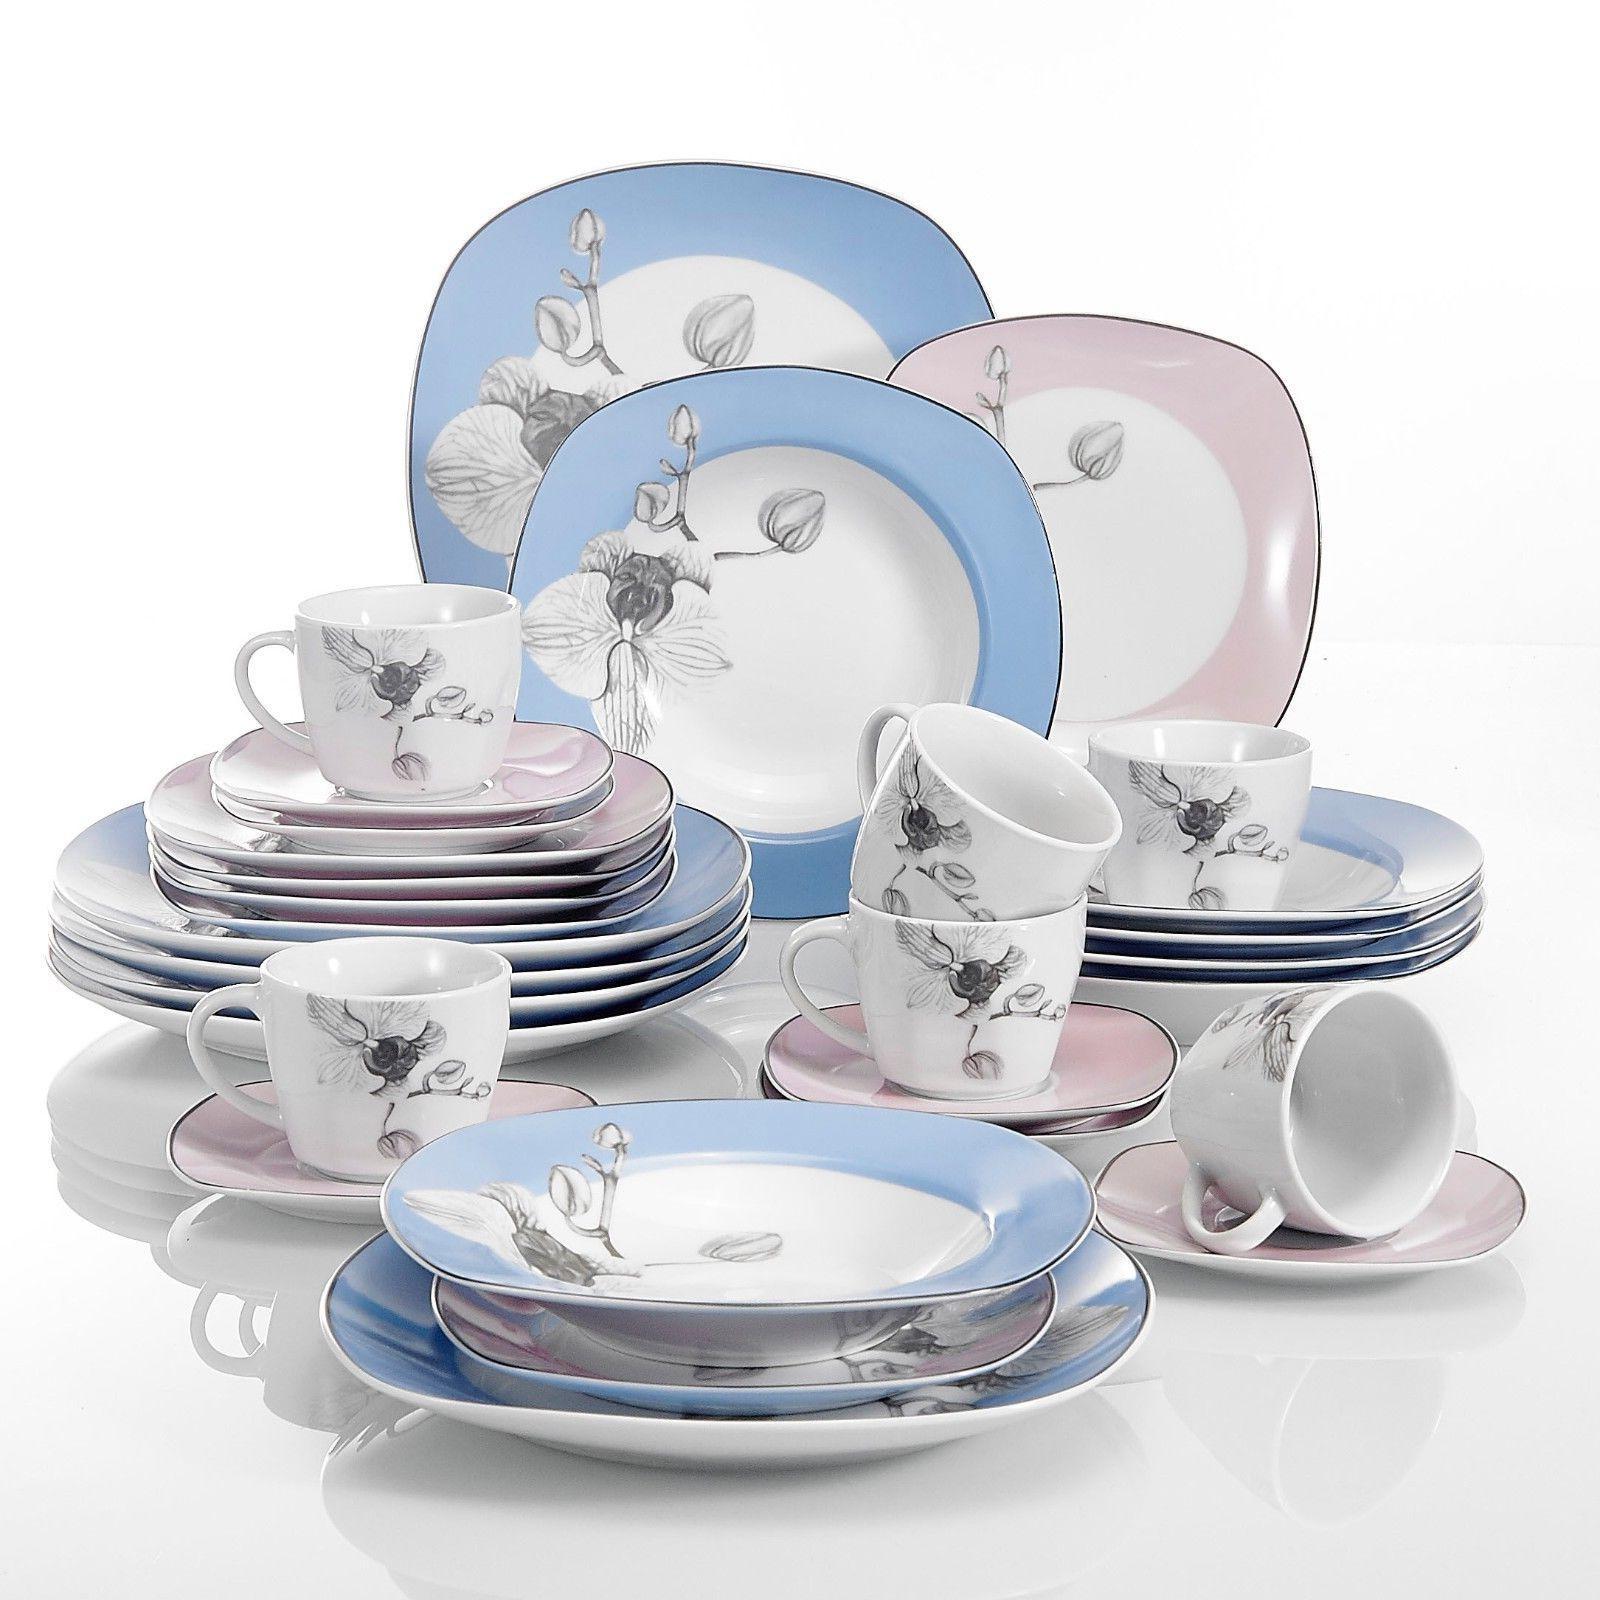 dinnerware set multi color patterns patterns kitchen